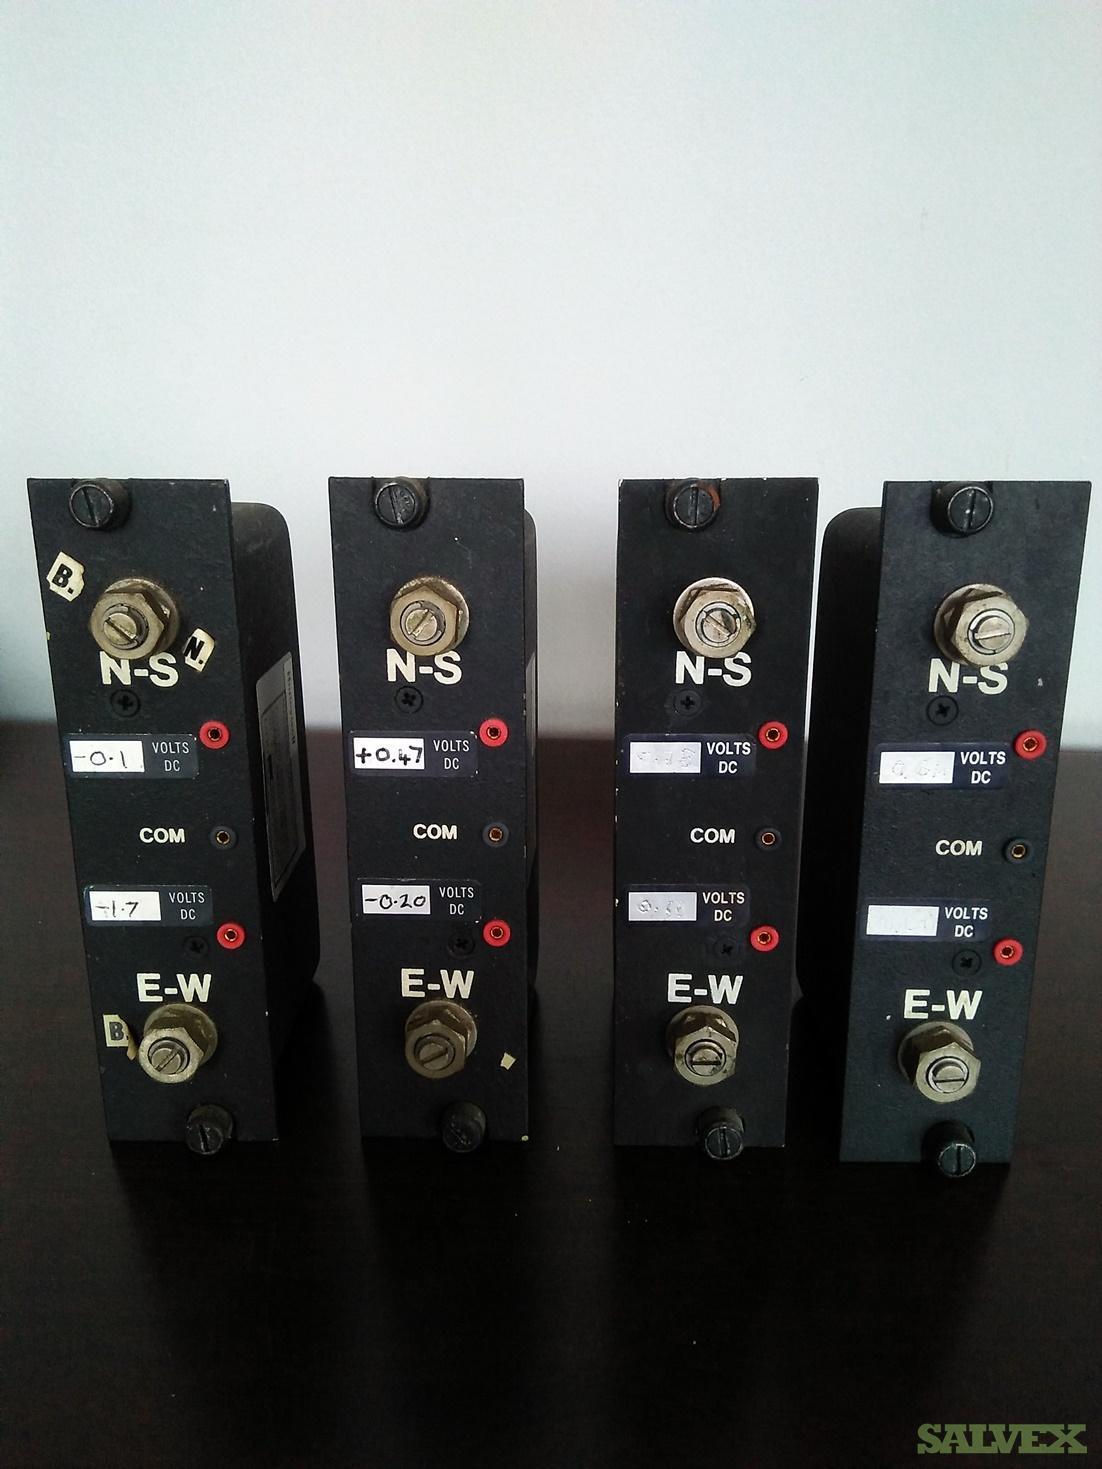 BAe 146 Aircraft Spare Parts: Magnetic Compensators, CFD Controller, Overheat Detectors, Air Traffic Computer  (18 Spare Parts)